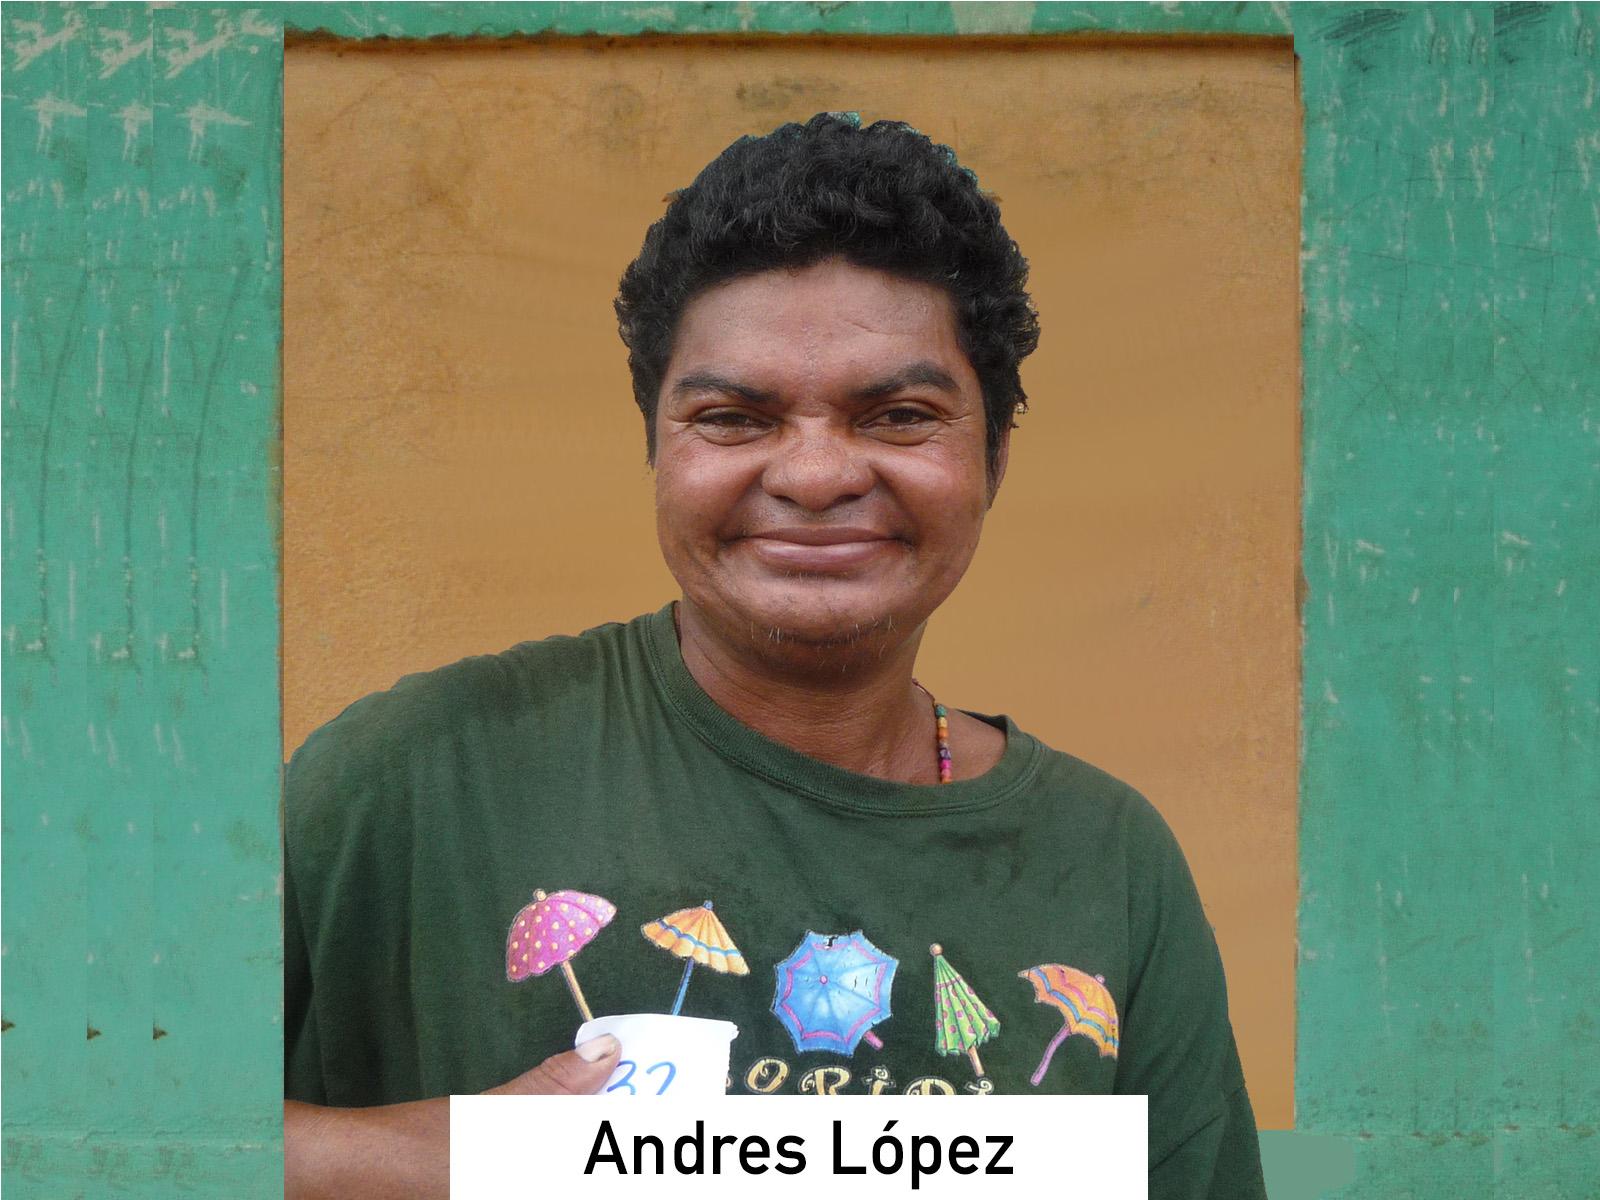 032 - Andres López.jpg